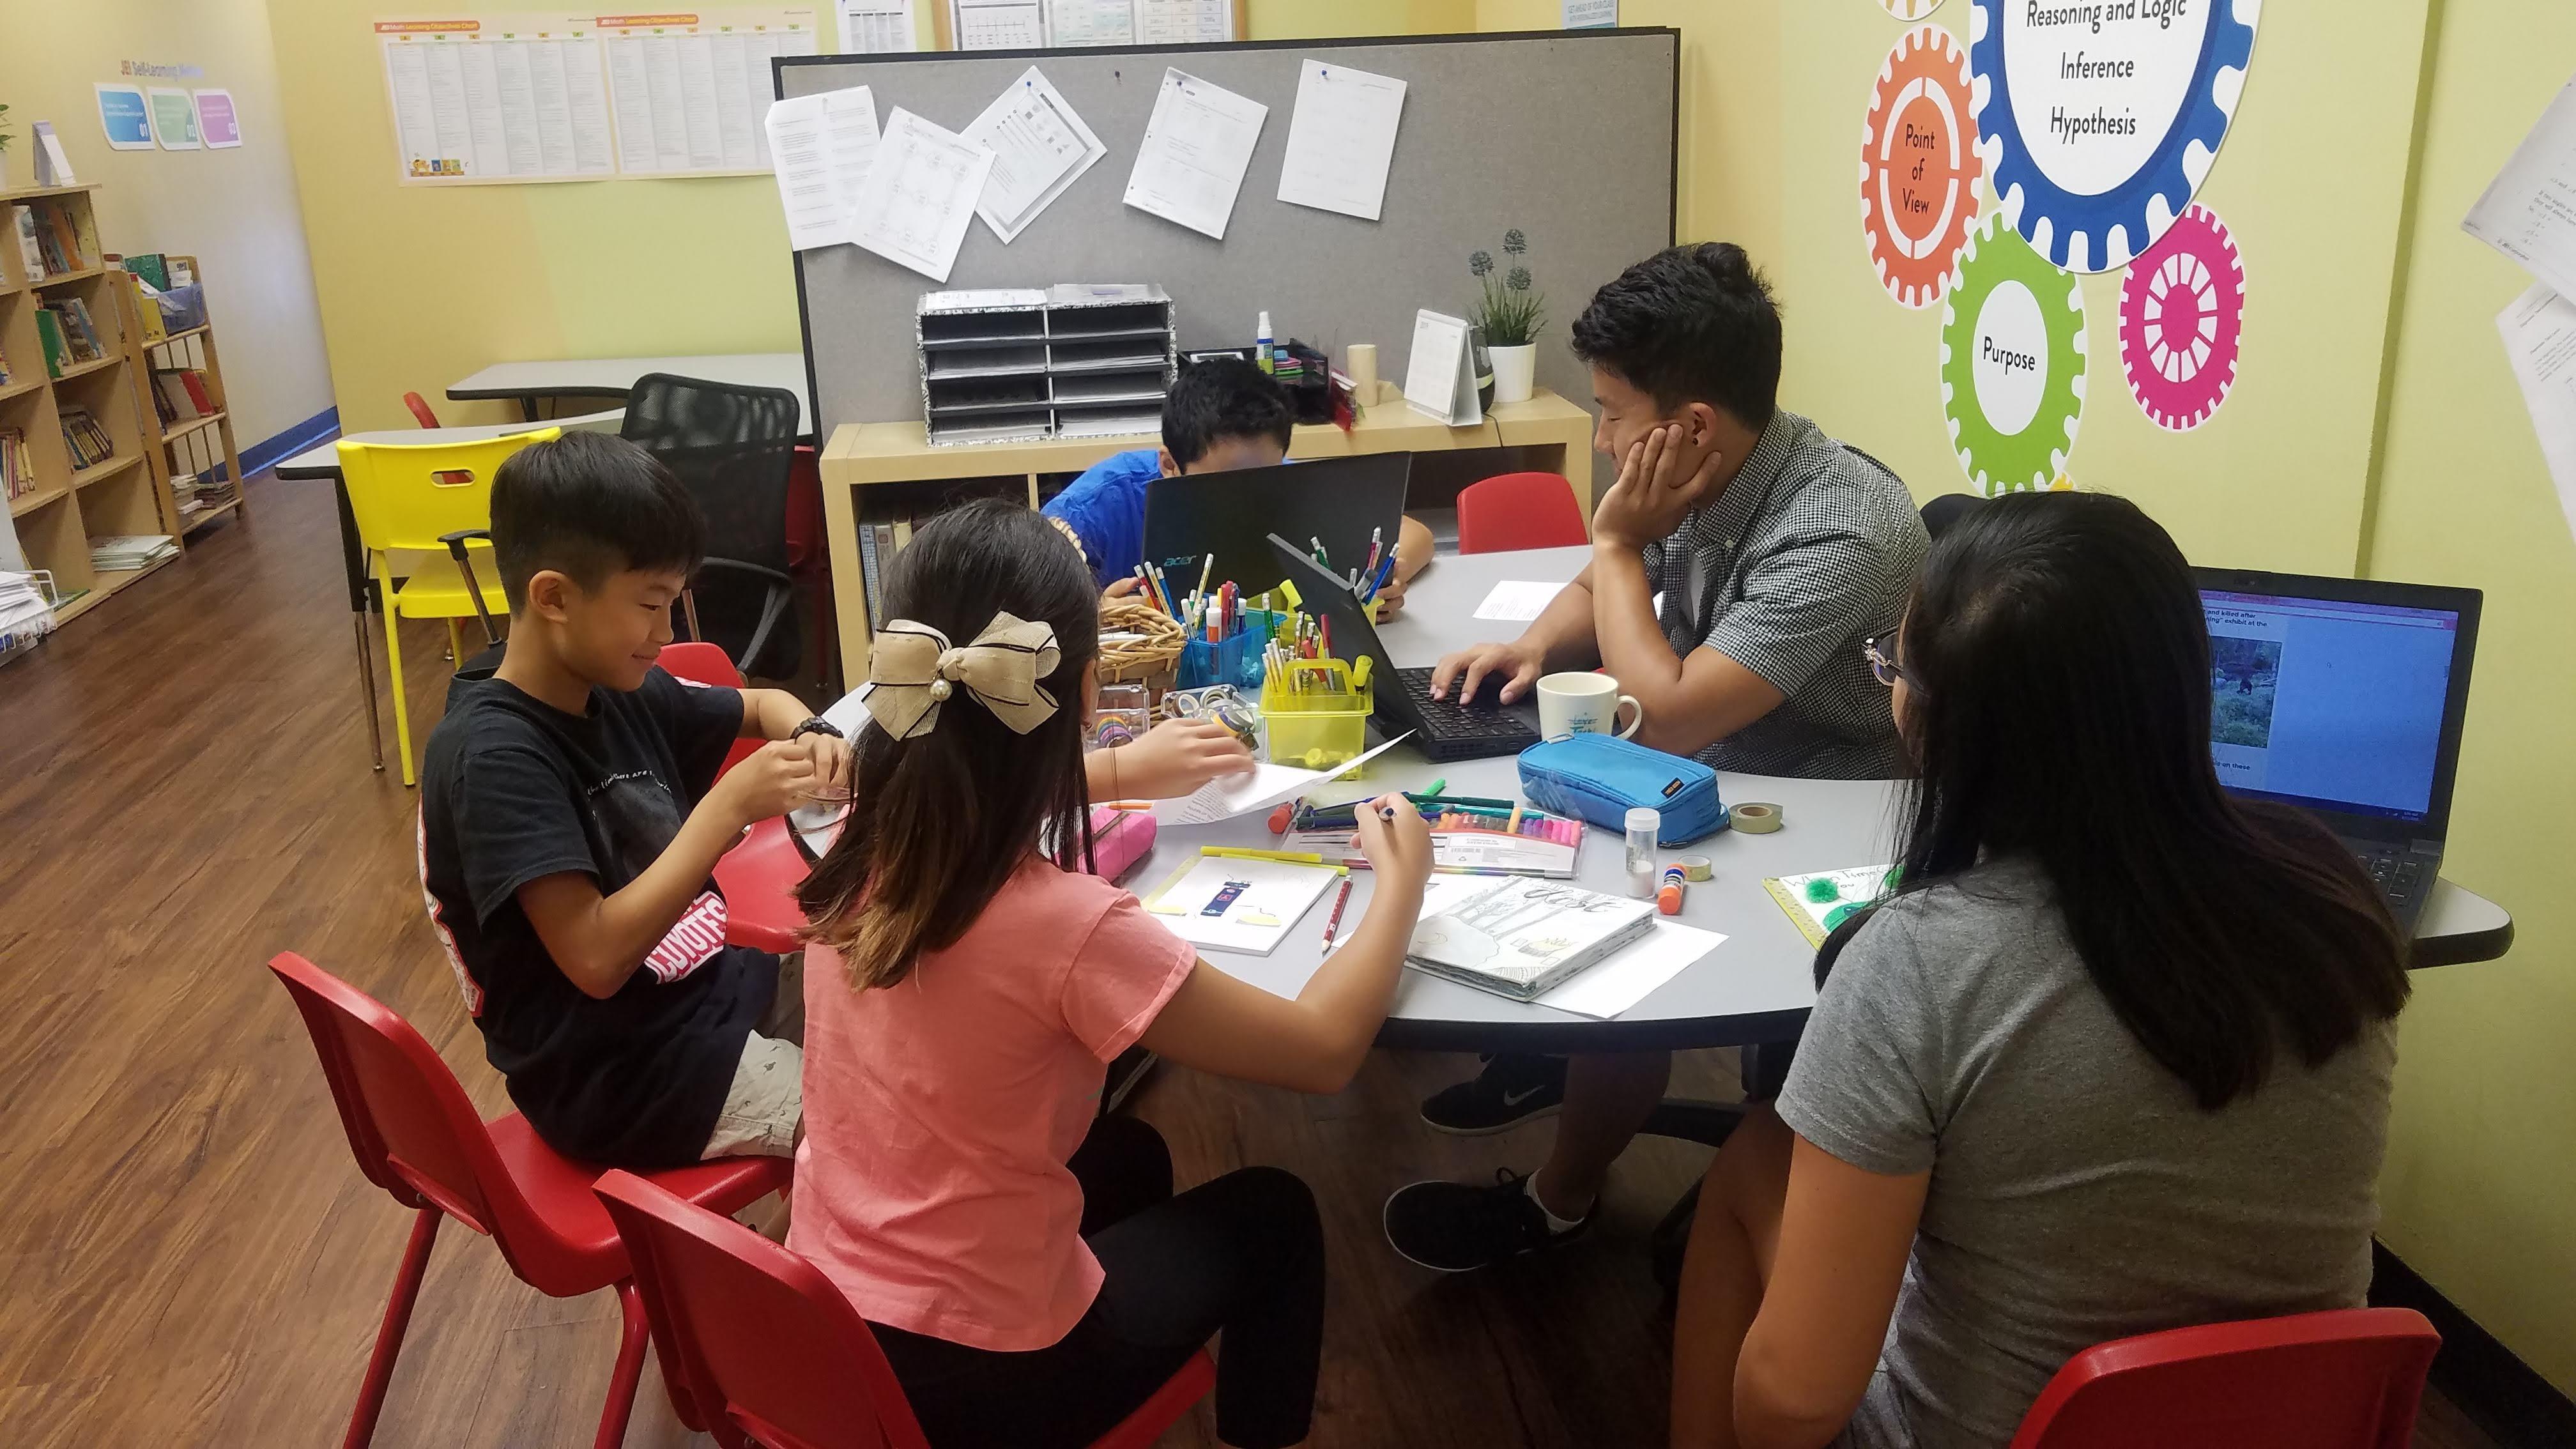 Children and Kids Tutoring Center - JEI Learning Center - San Diego